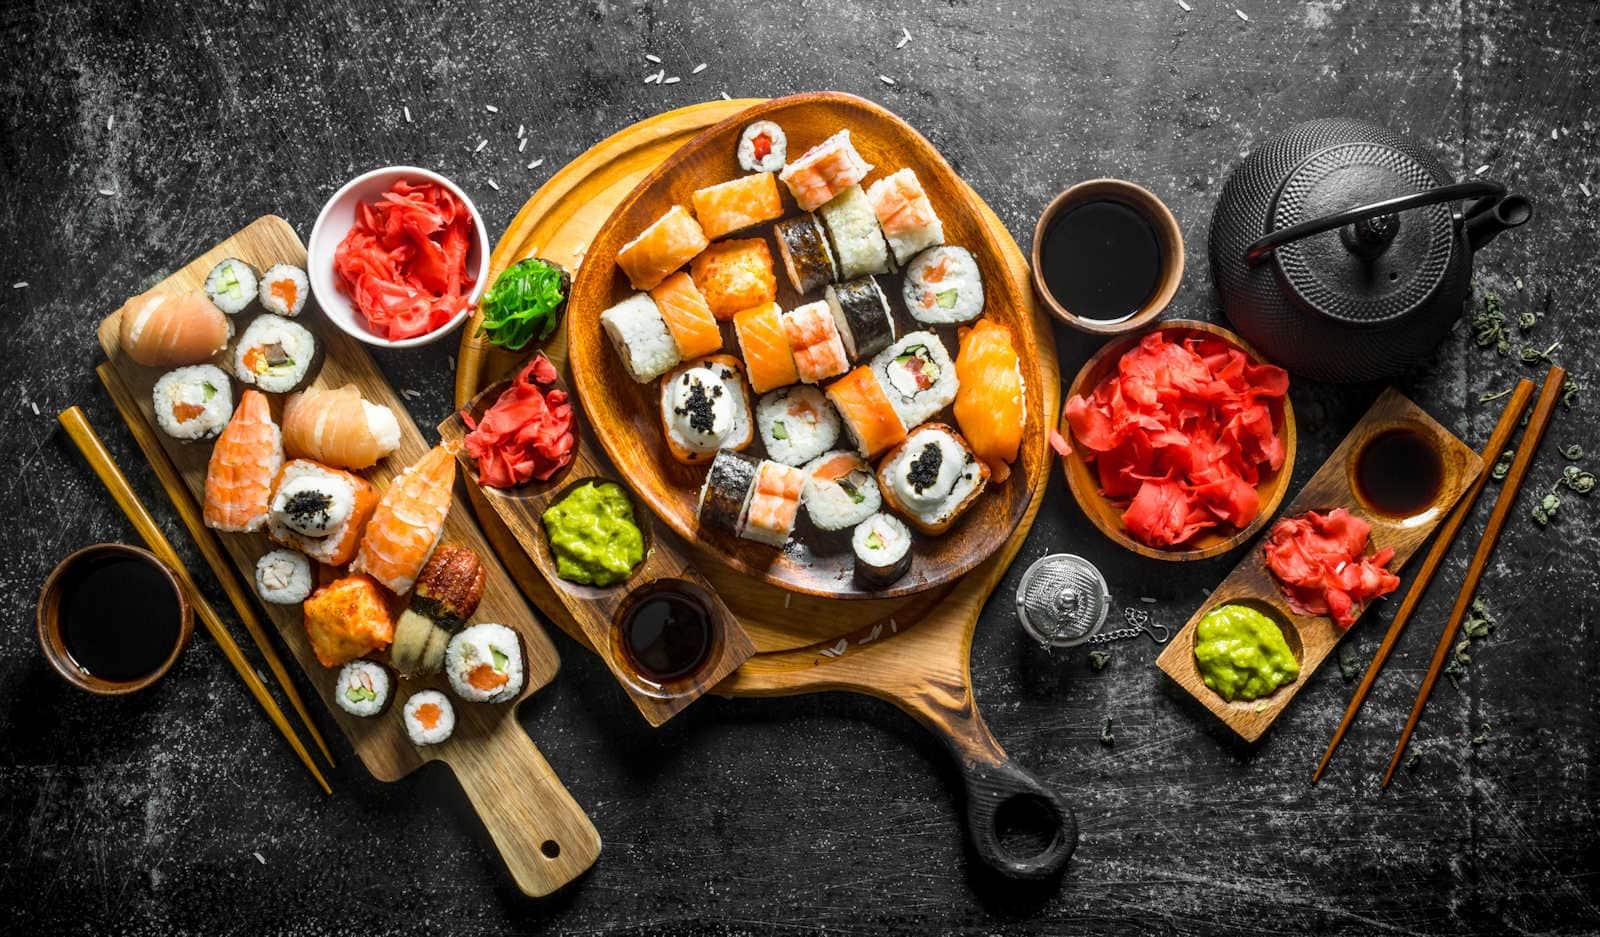 Nama Sushi SF of San Francisco